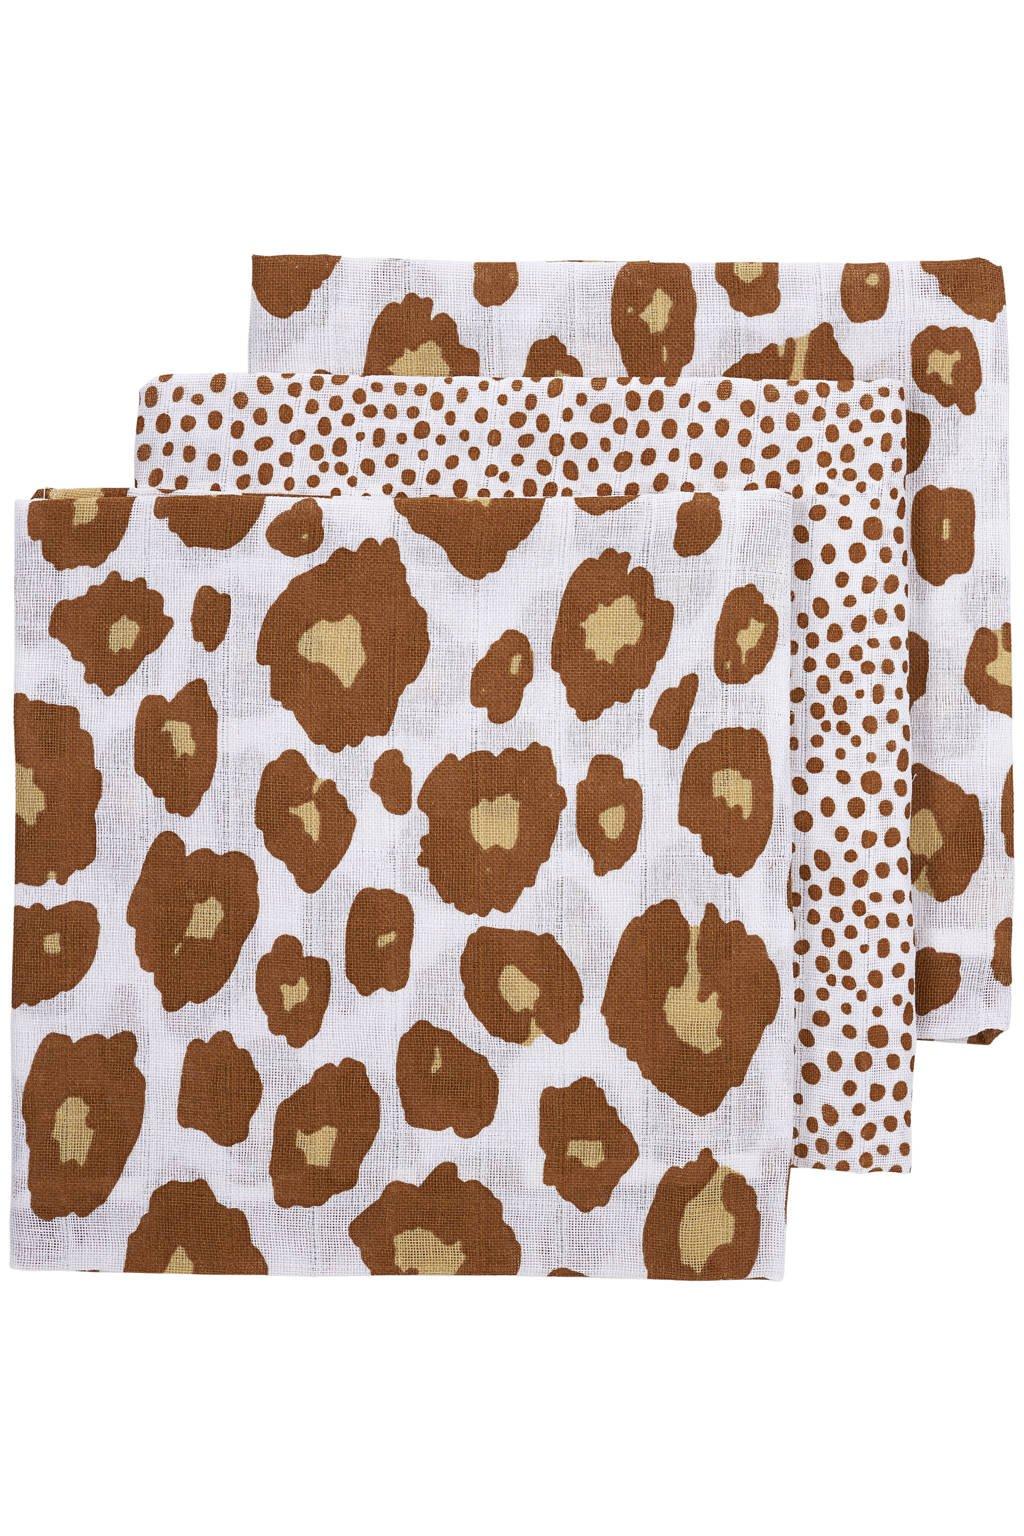 Meyco hydrofiele luier - set van 3 70x70 cm Panter-Cheetah camel, Camel/wit/oker